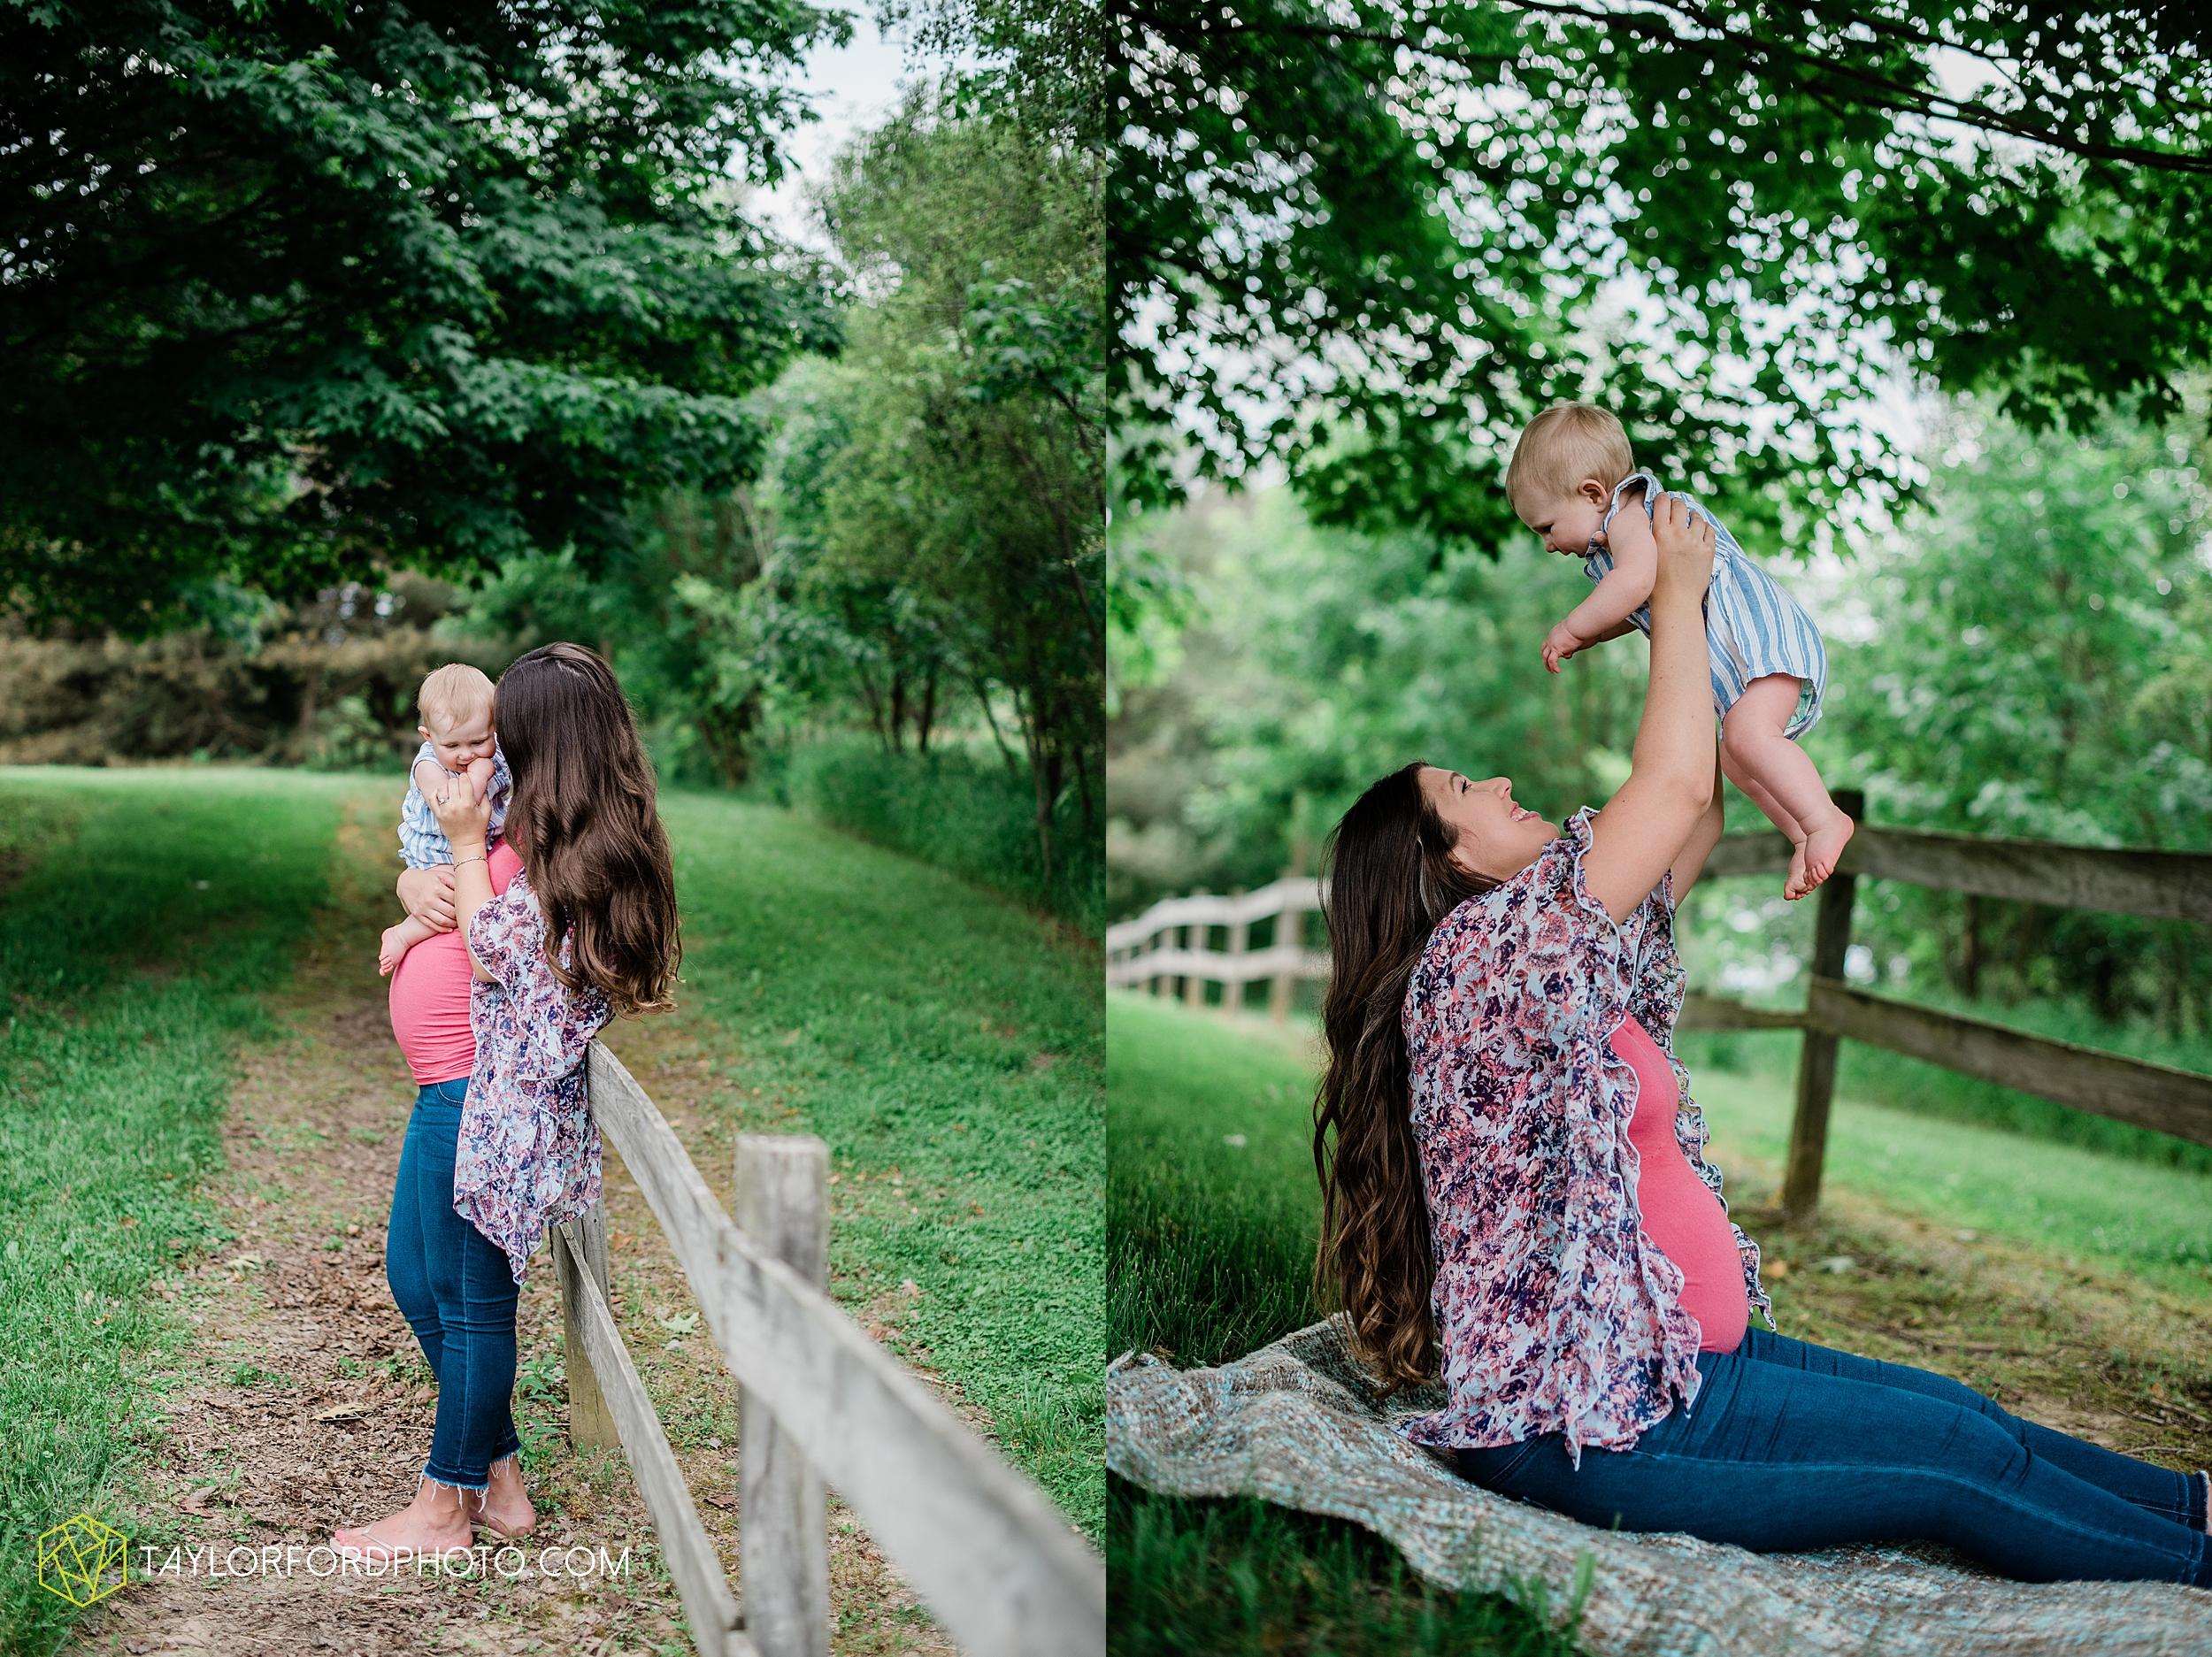 wasserman-family-maternity-summer-photographer-matea-park-leo-fort-wayne-indiana-photography-taylor-ford-hirschy-photographer_3329.jpg